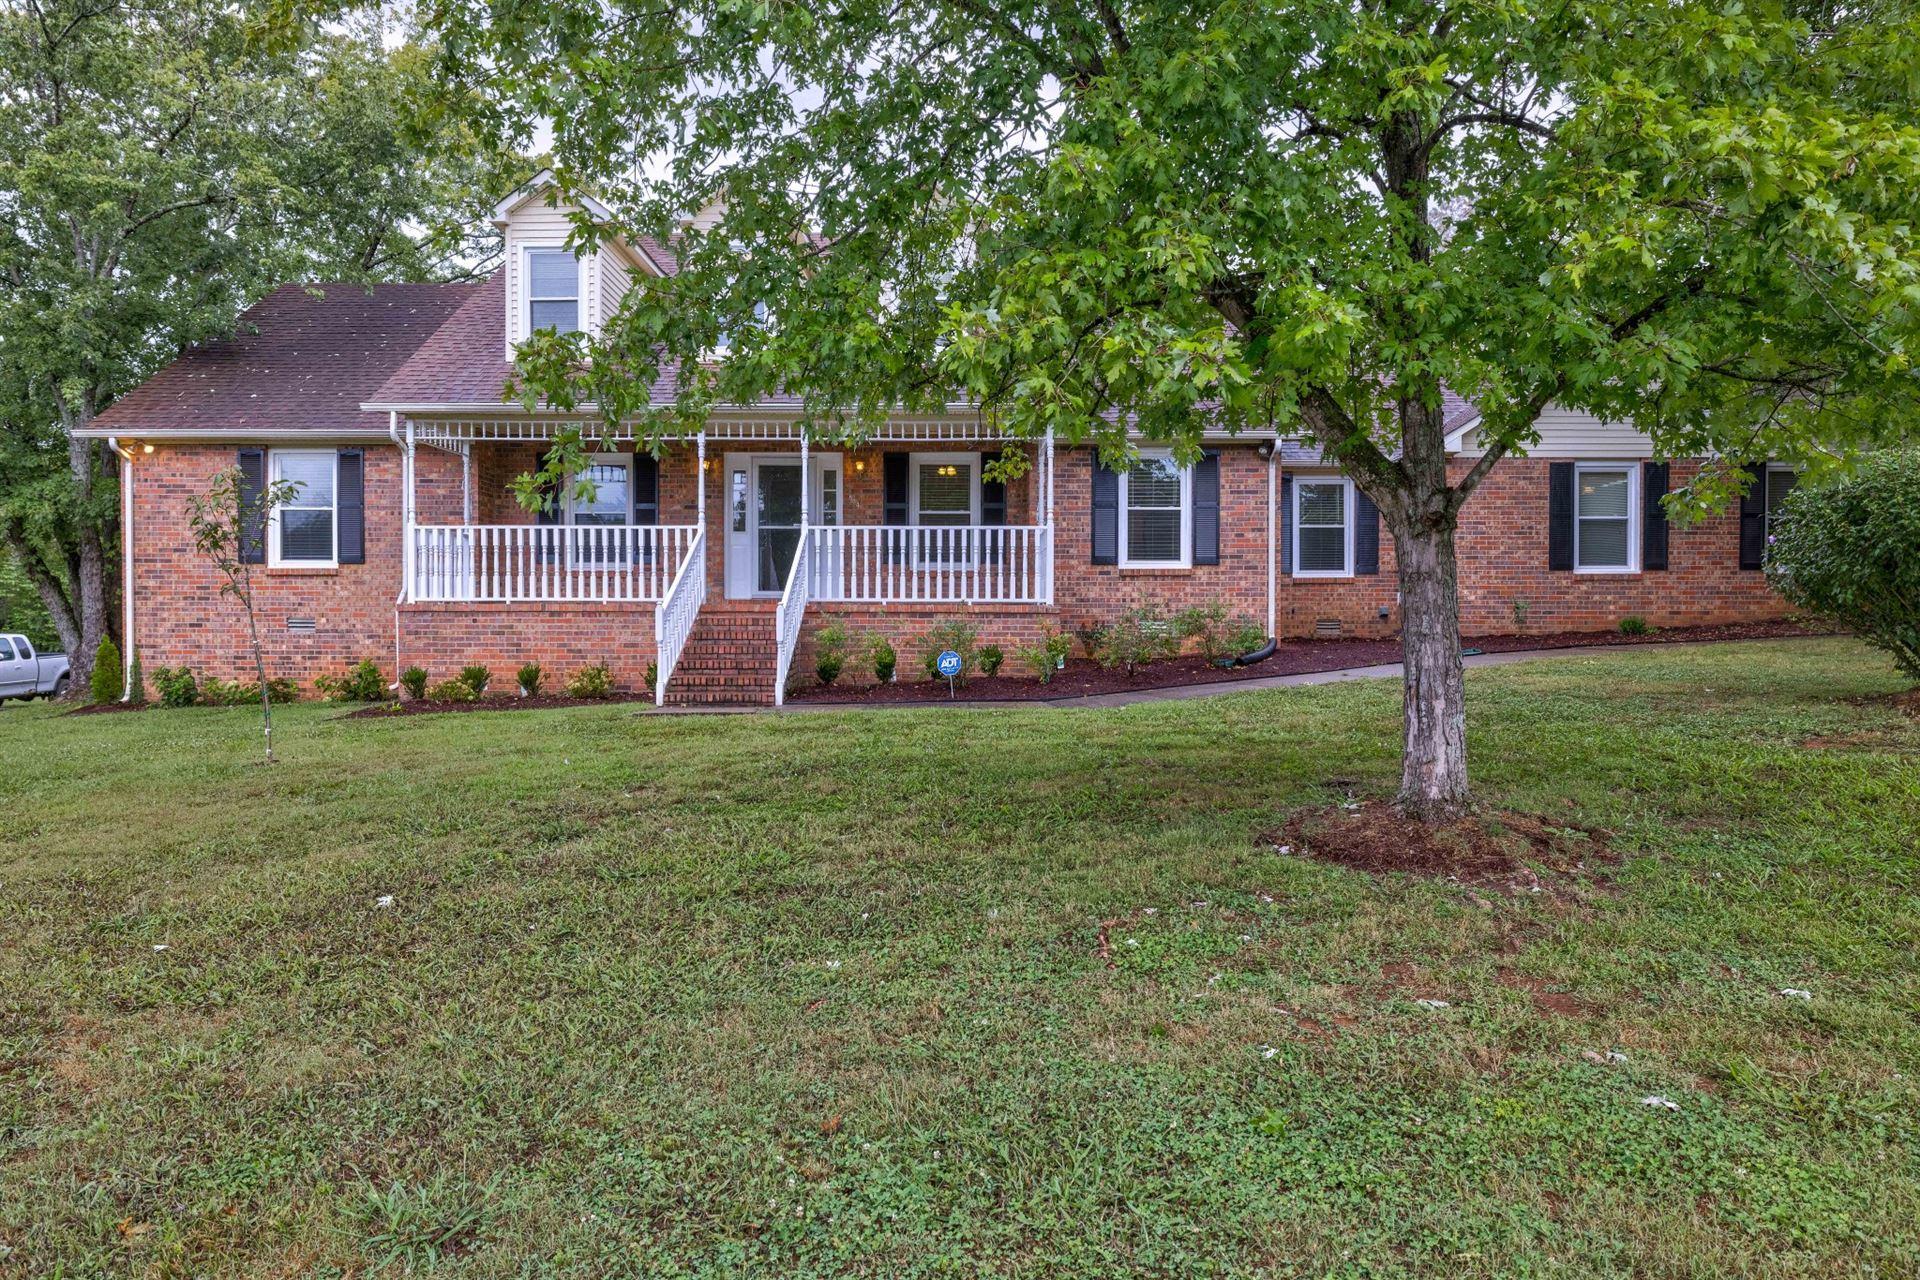 814 River Rock Blvd, Murfreesboro, TN 37128 - MLS#: 2292402